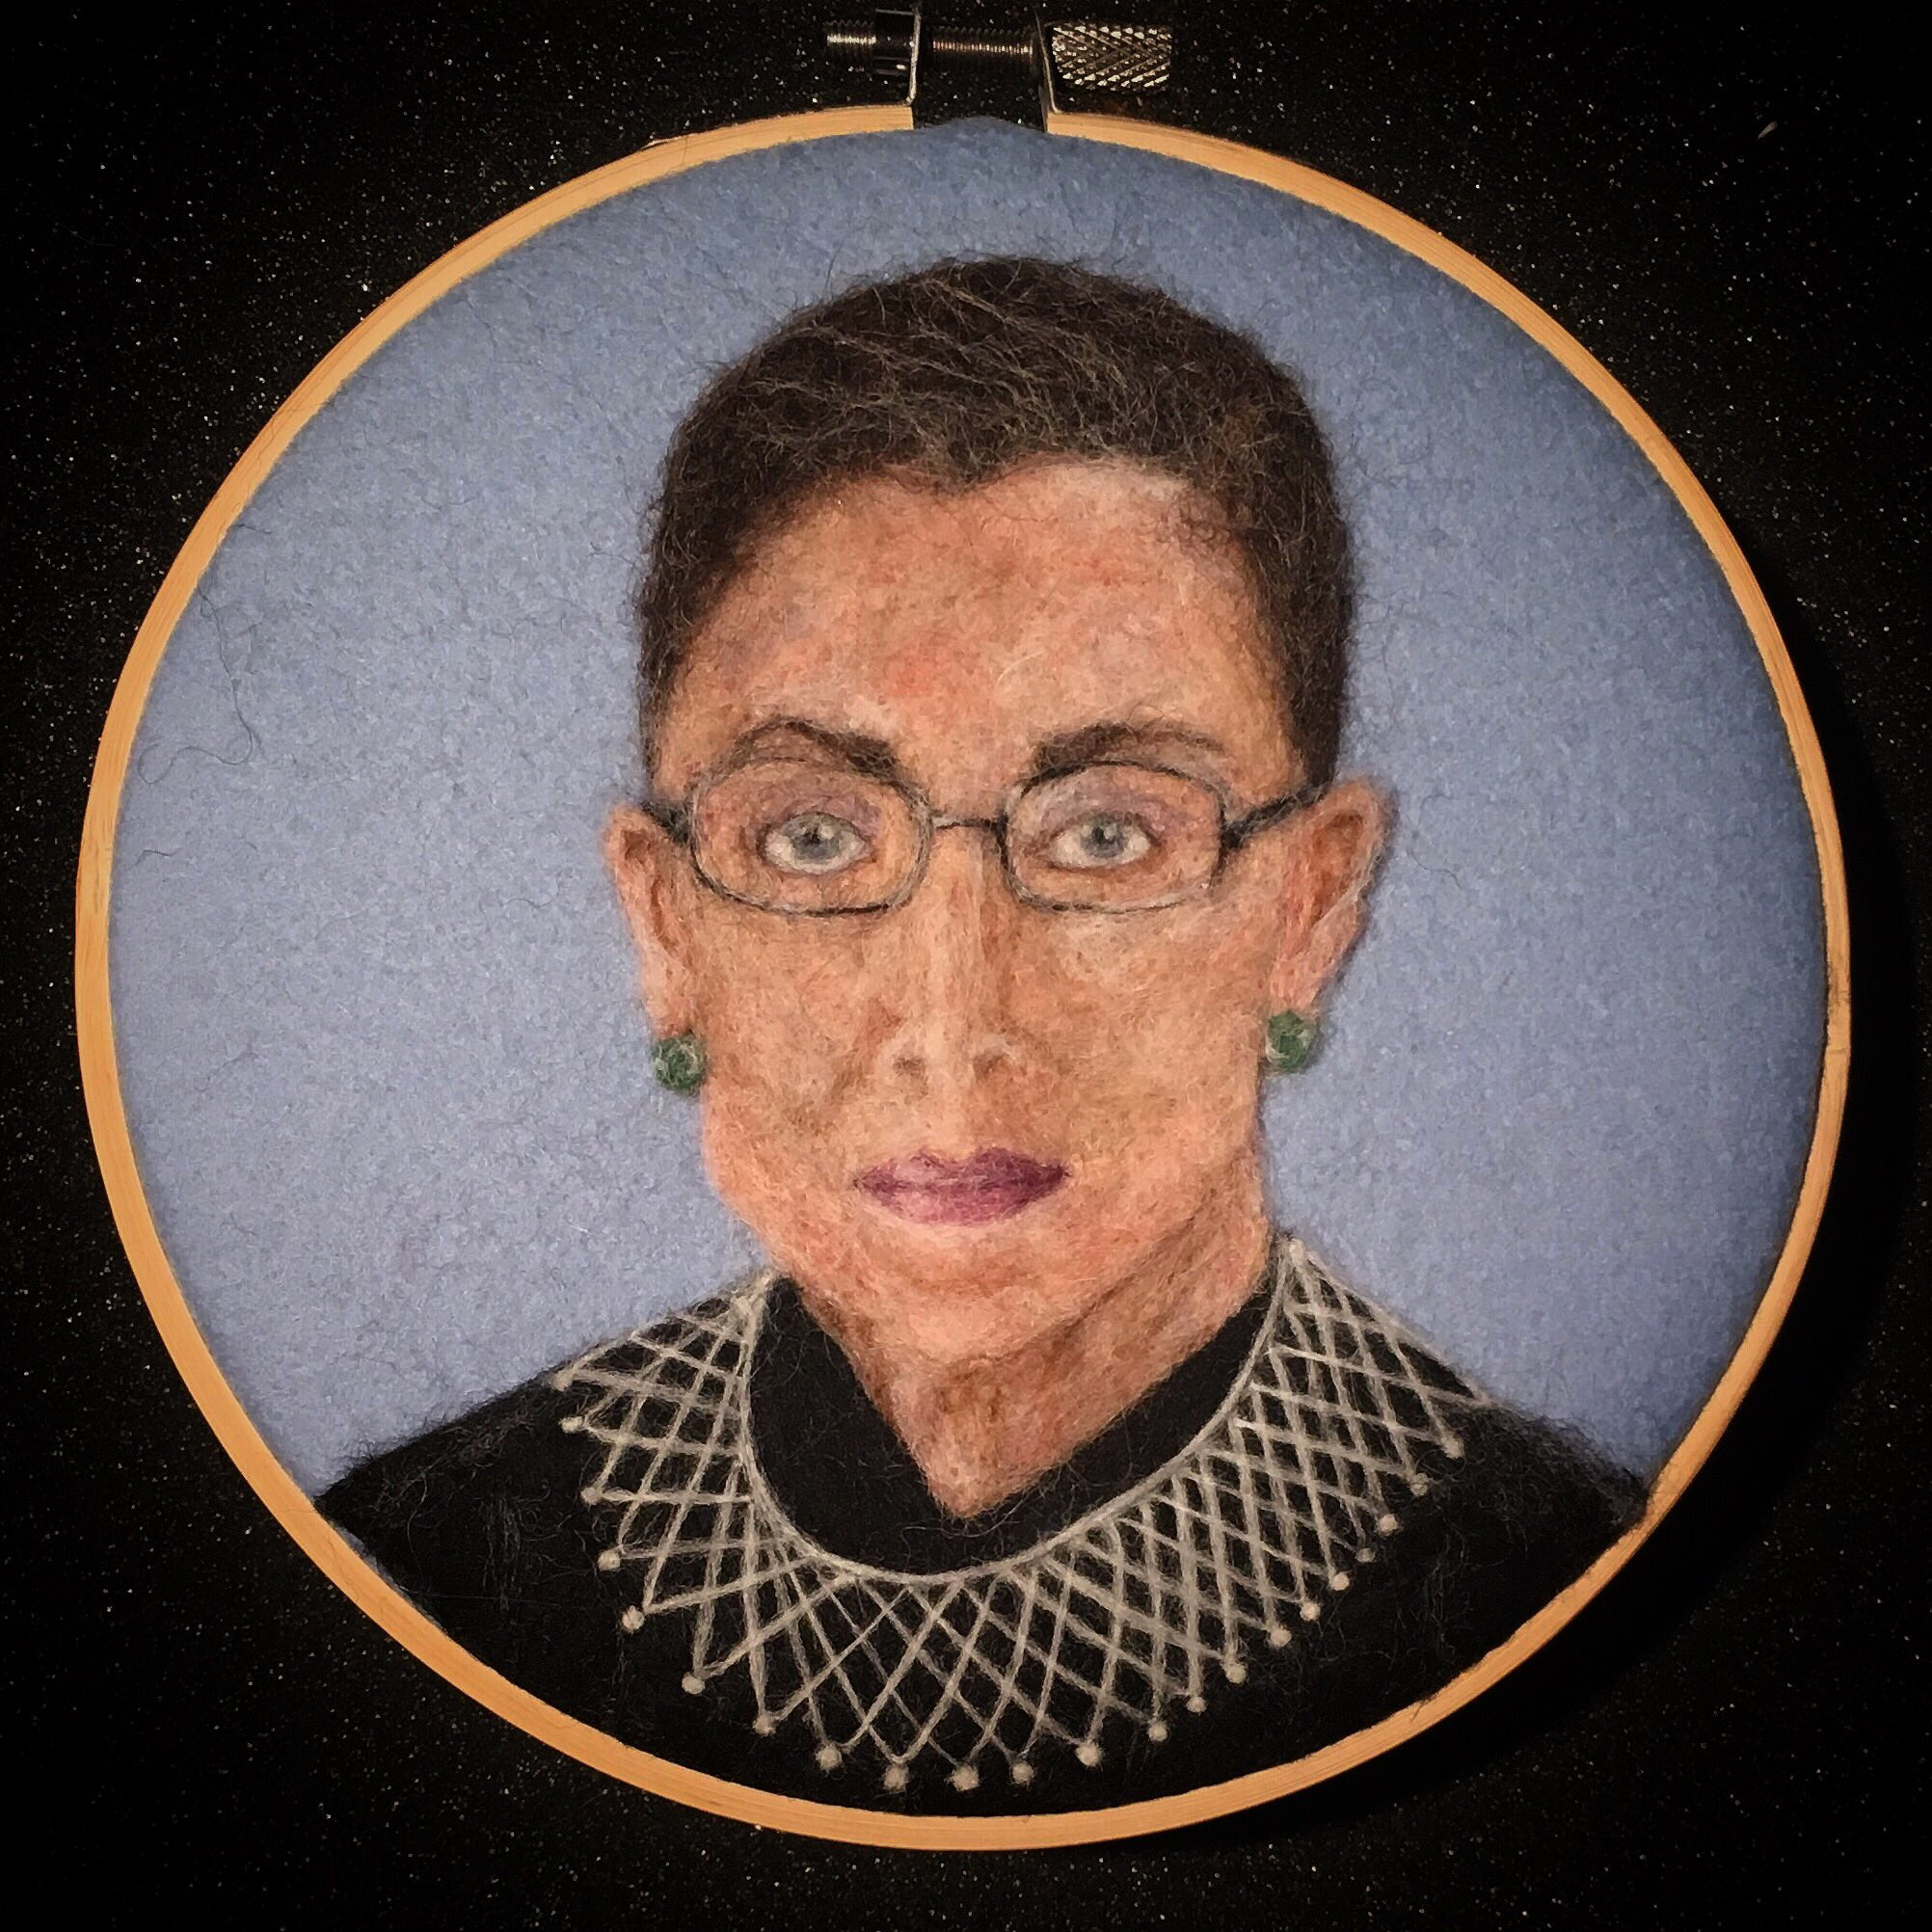 Happy 84th birthday to Ruth Bader Ginsburg